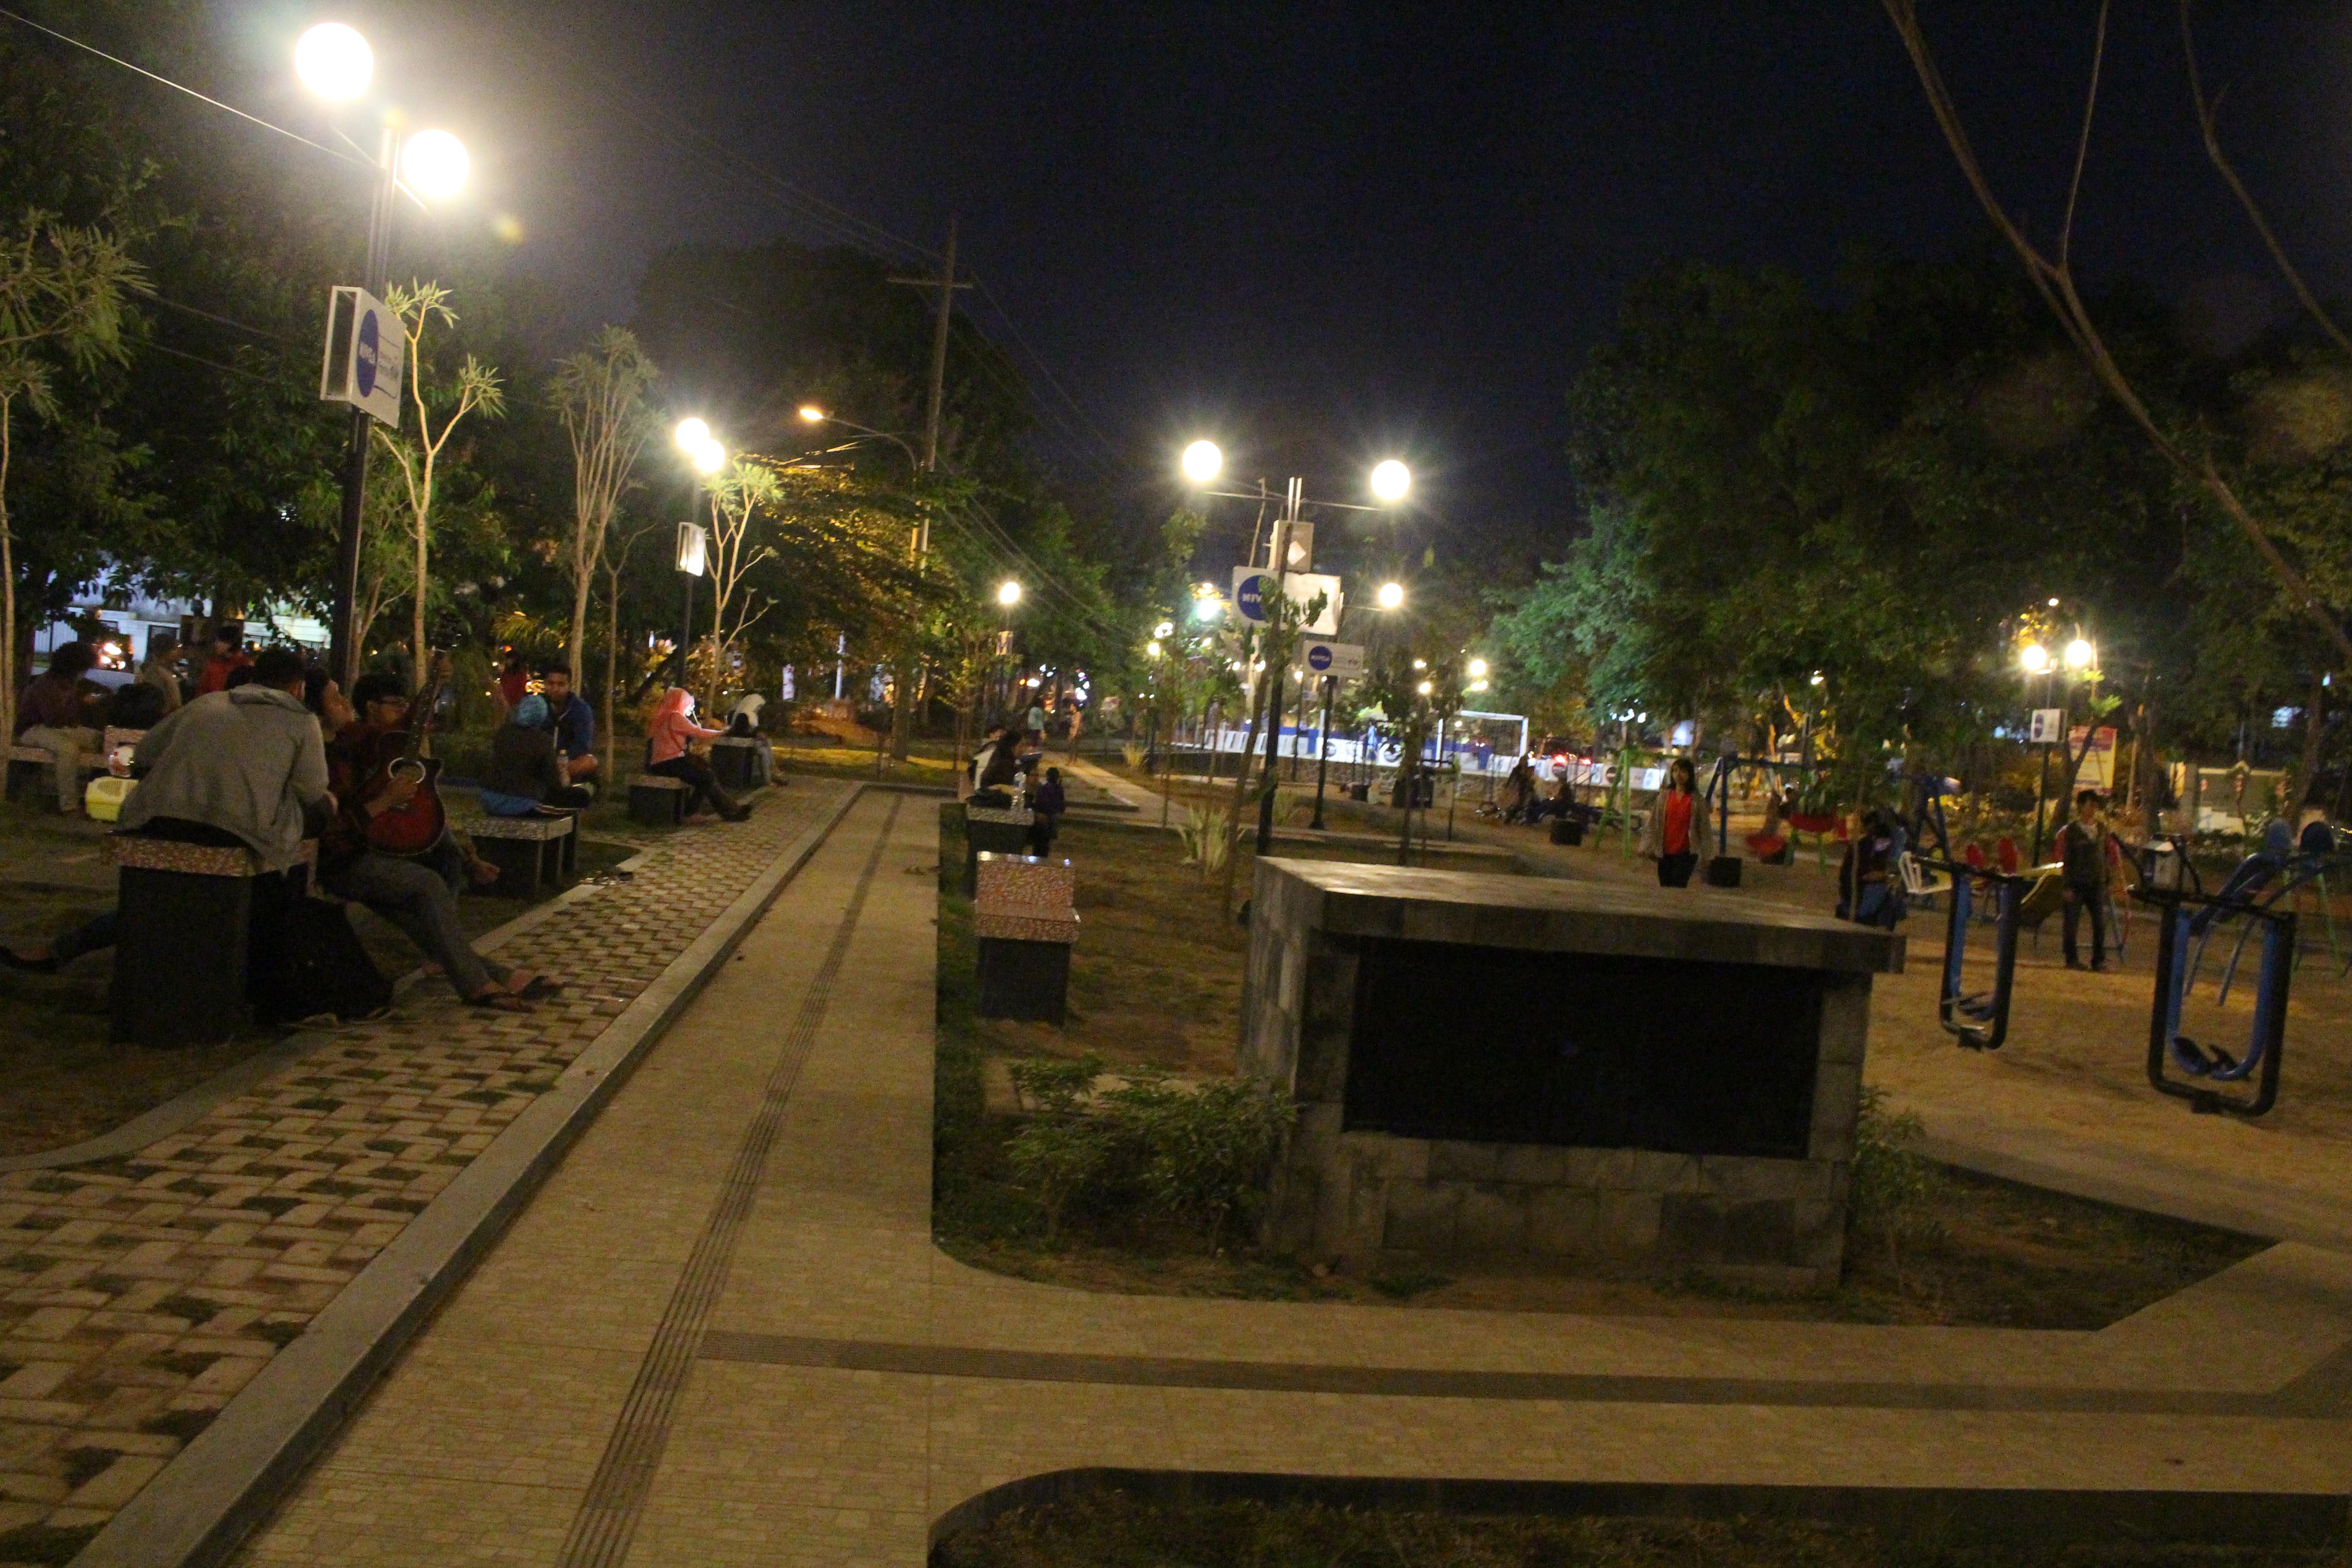 Perkembangan Taman Kota Malang Merbabu Family Park Kondisi Malam Hari